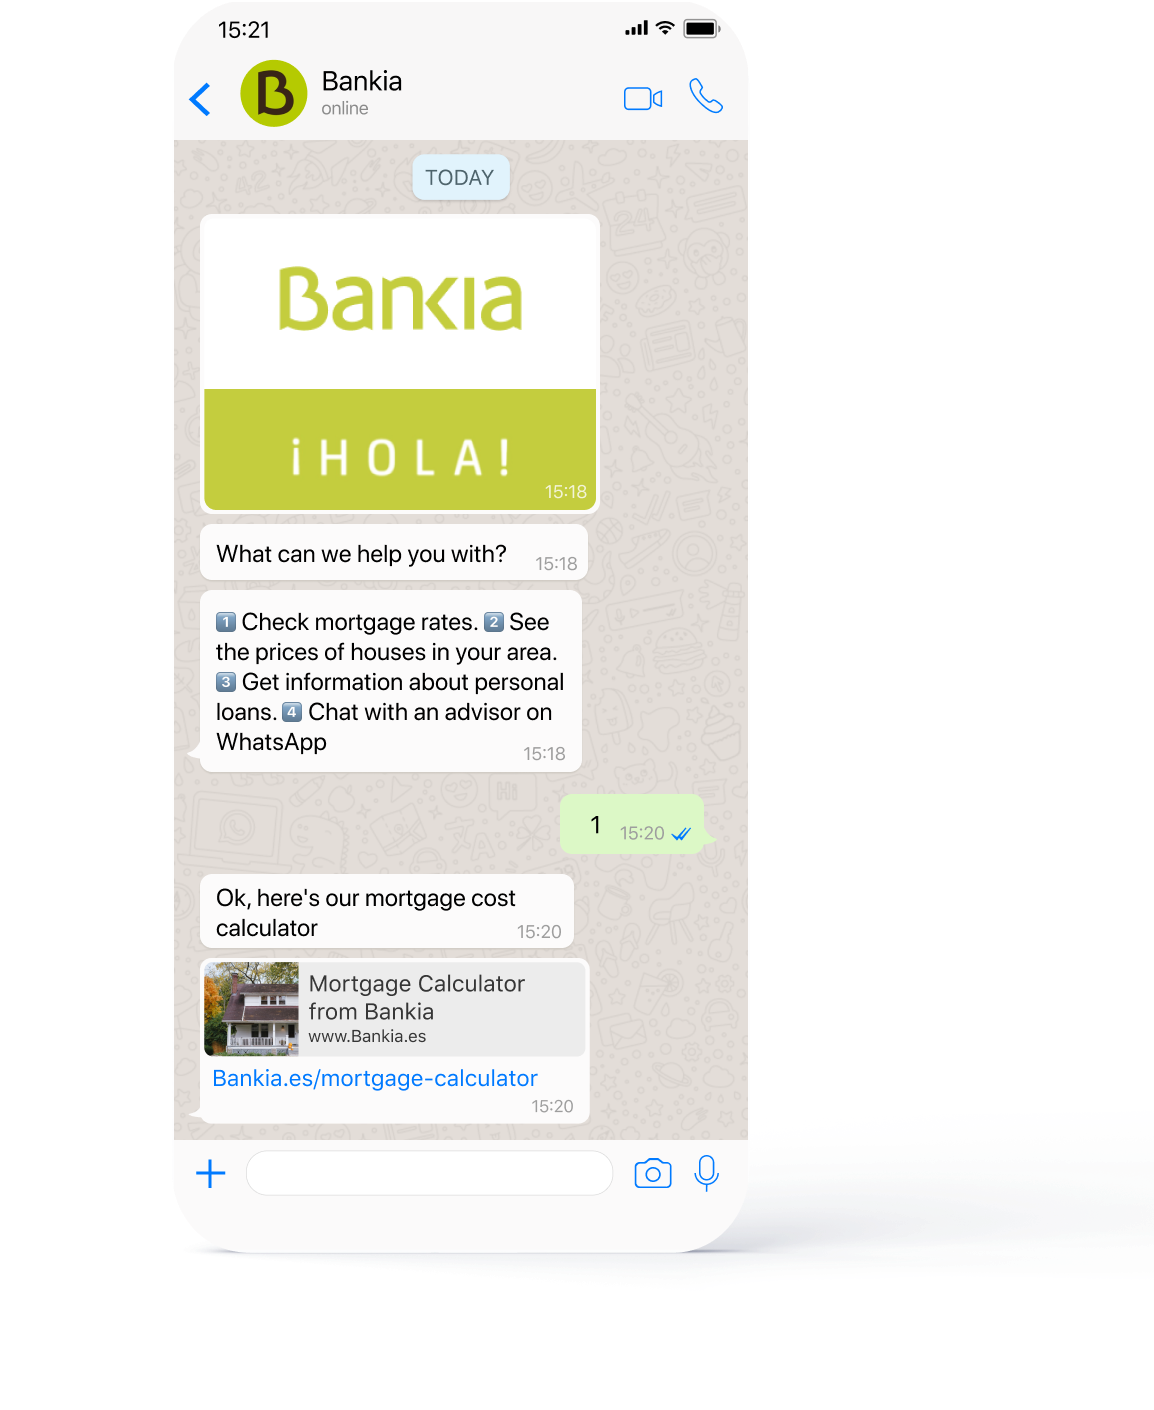 bankia whatsapp cx customer experience